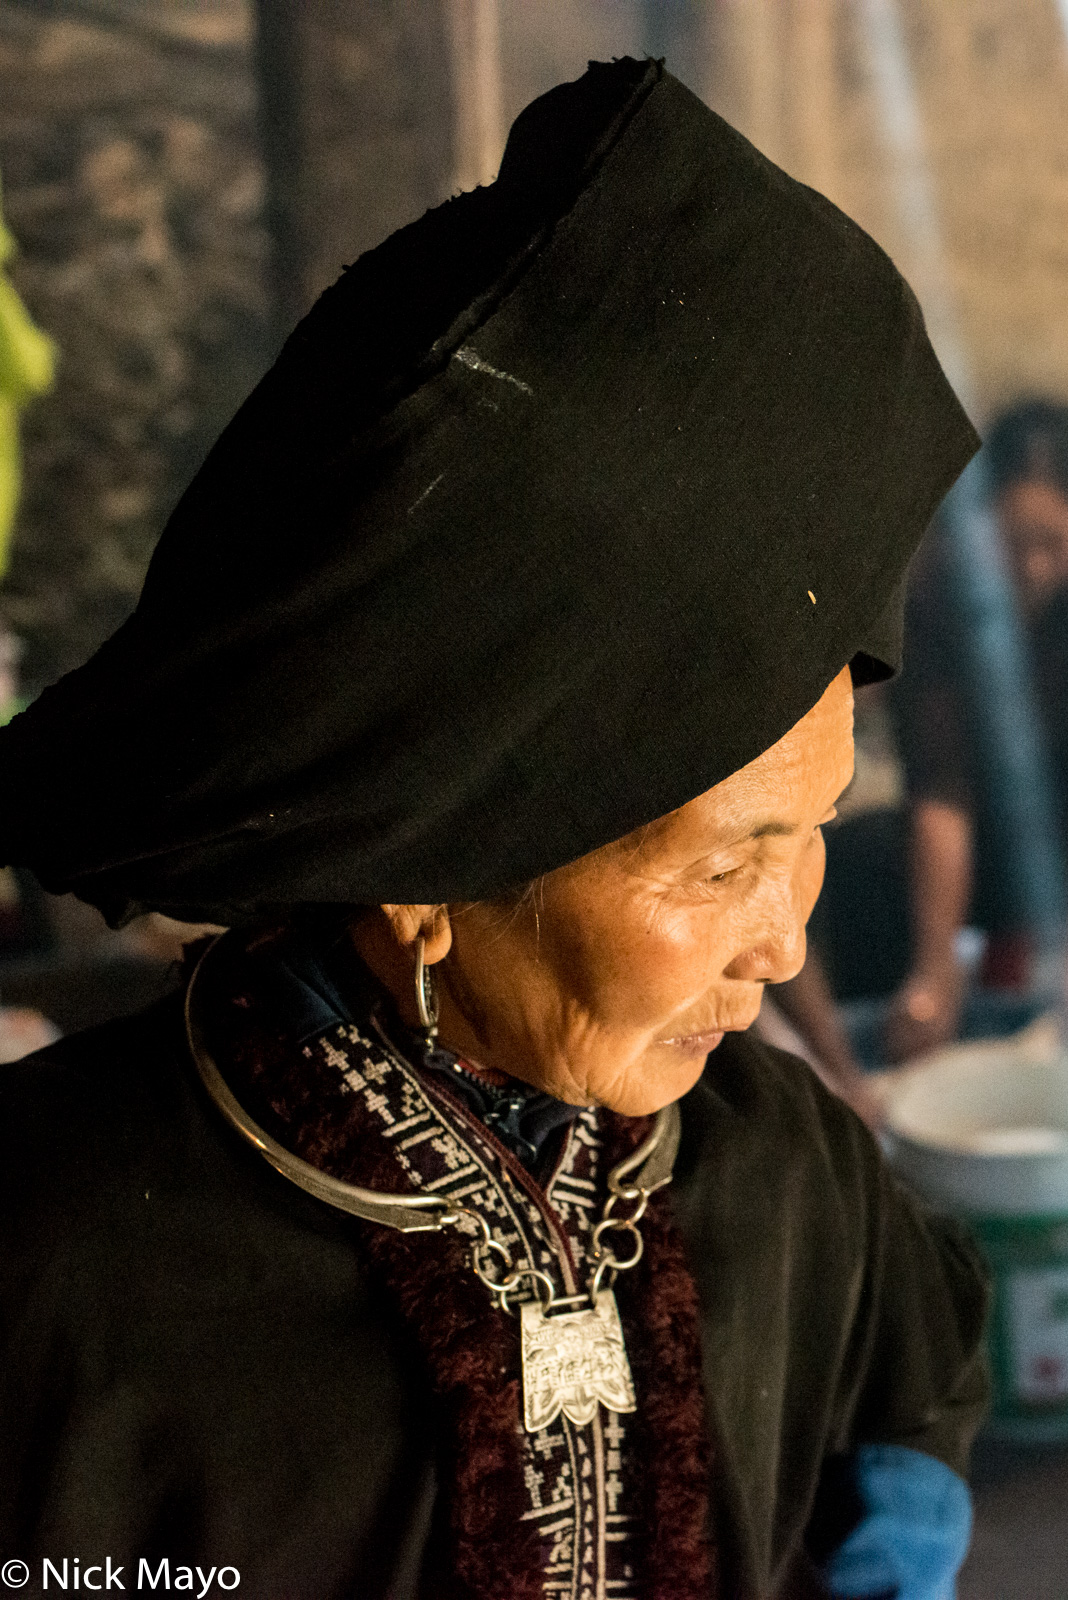 Earring, Lai Chau, Necklace, Turban, Vietnam, Yao, photo